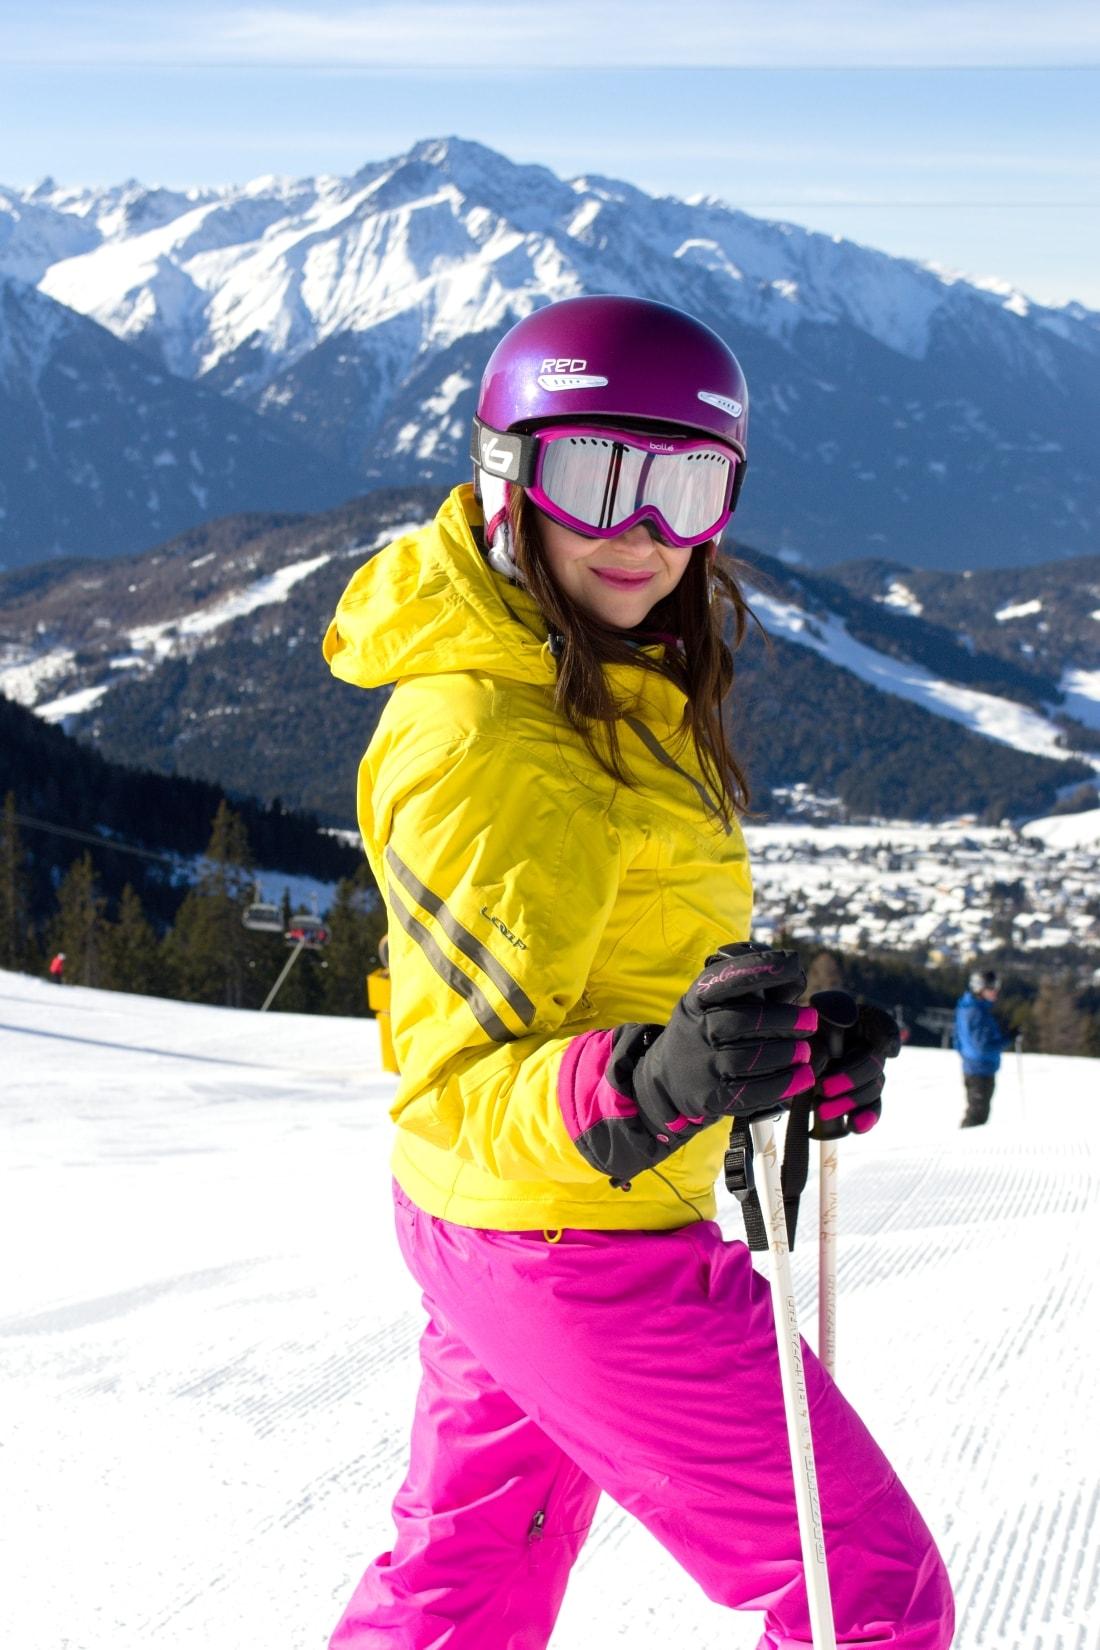 LYŽOVAČKA V TIROLSKOM SEEFELDE_Katharine-fashion is beautiful_Blog 10_Ružová lyžiarska prilba Bolle_Katarína Jakubčová_Fashion blogger